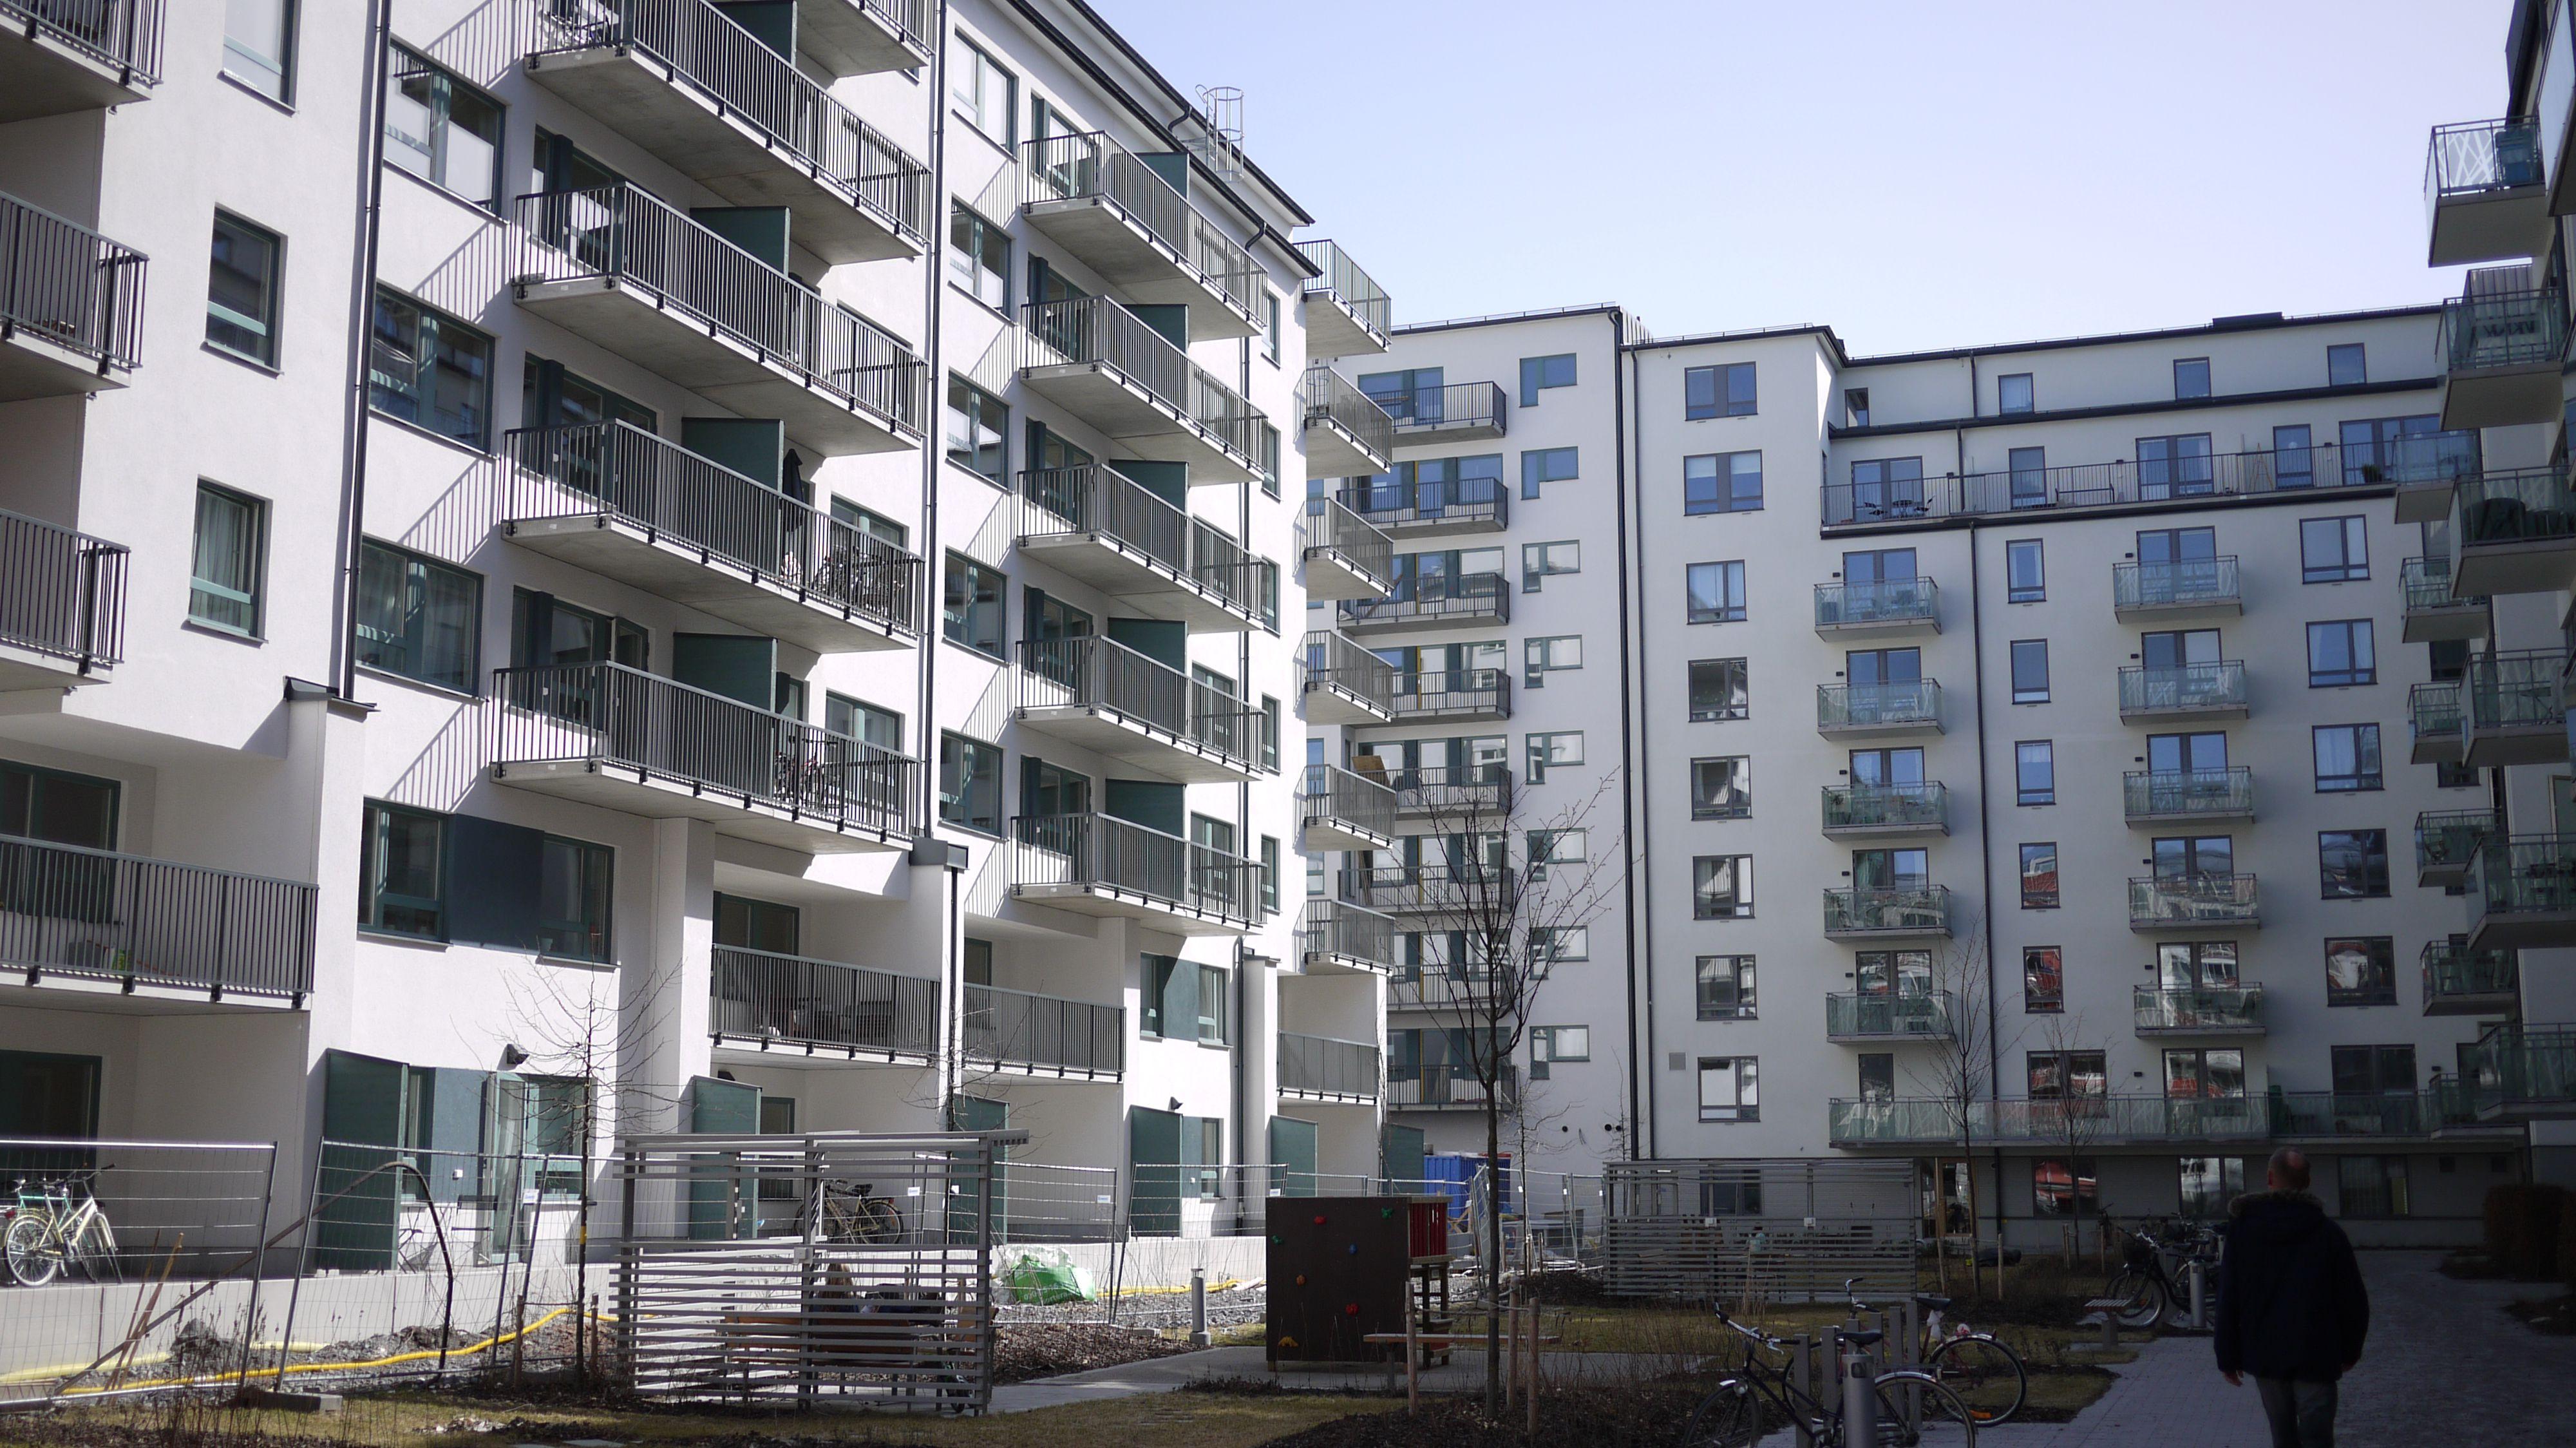 Stockholm housing